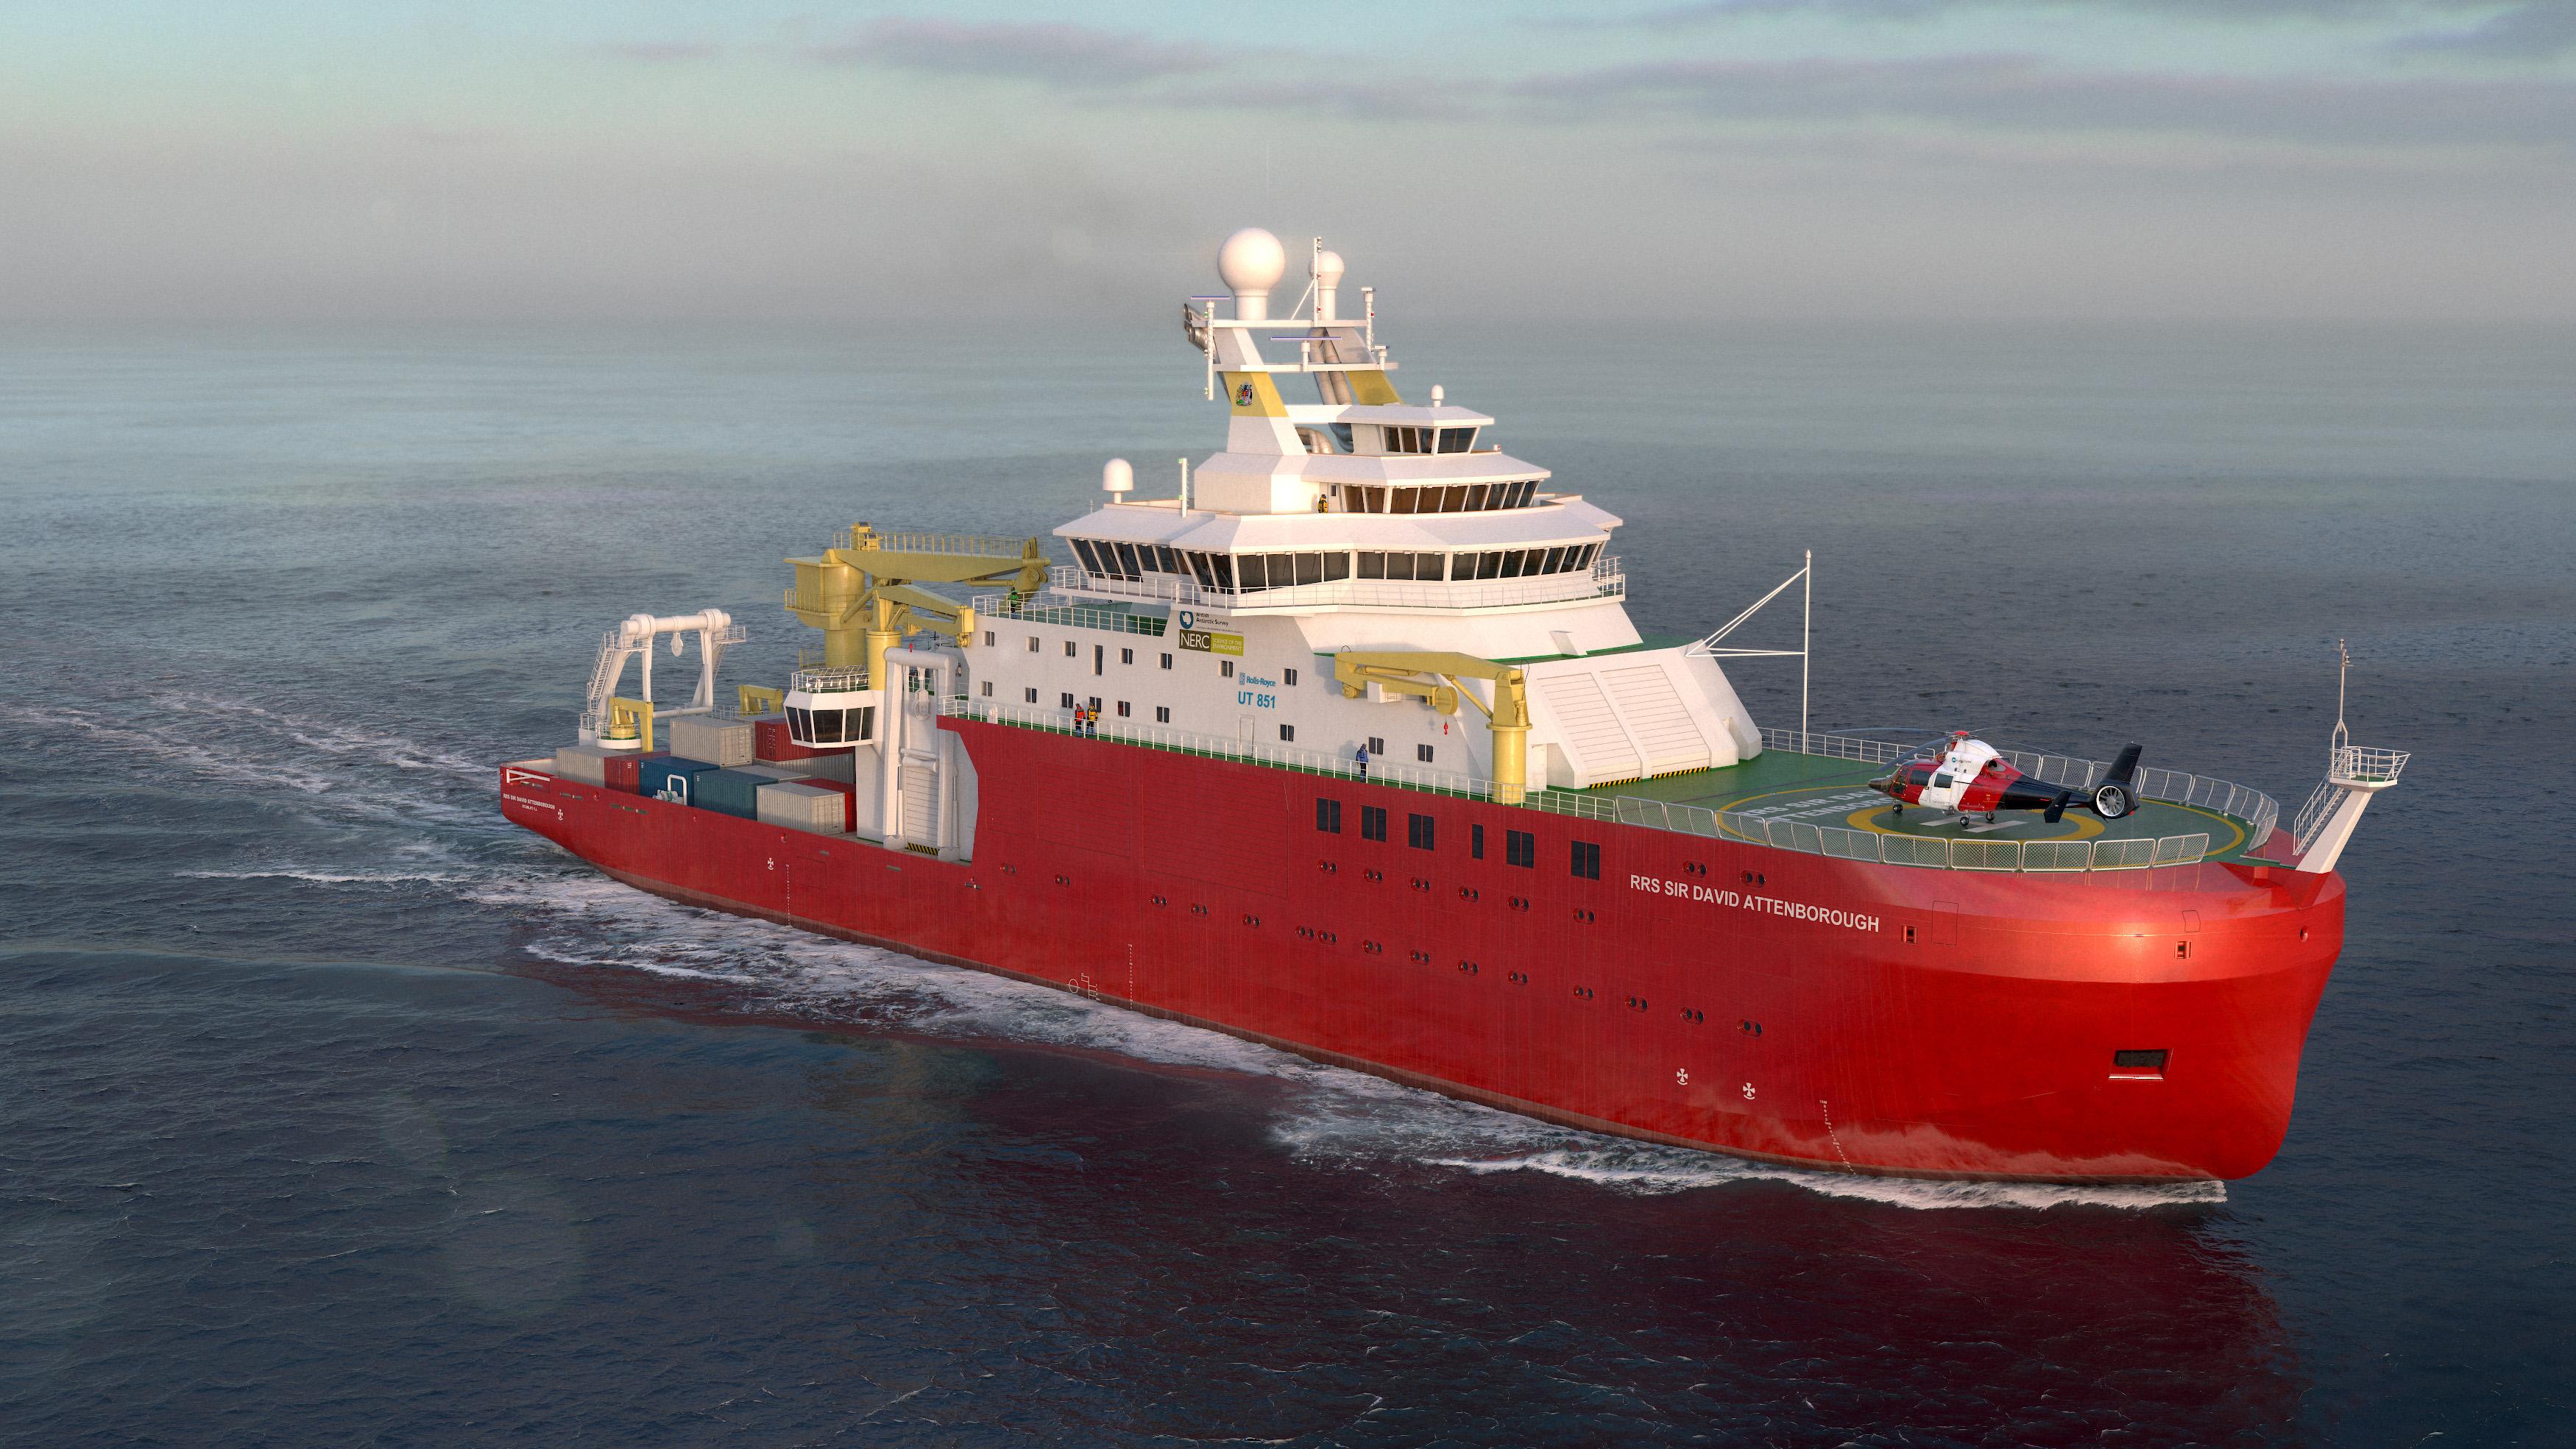 RRS Sir David Attenborough - British Antarctic Survey